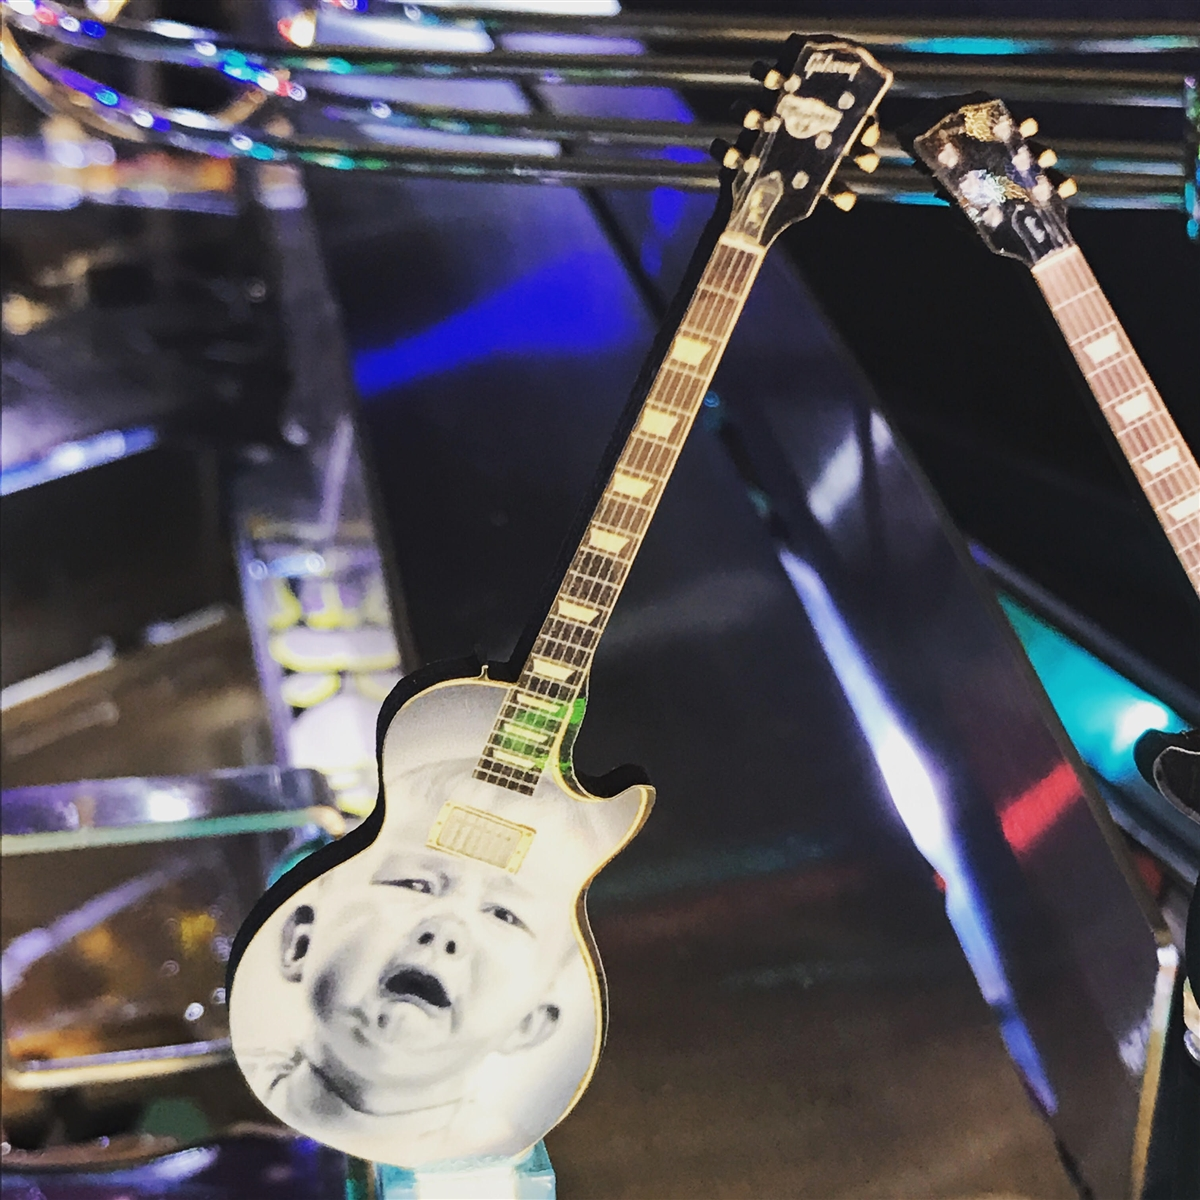 Custom Graphic Guitar MOD for any Music Themed pinball machine